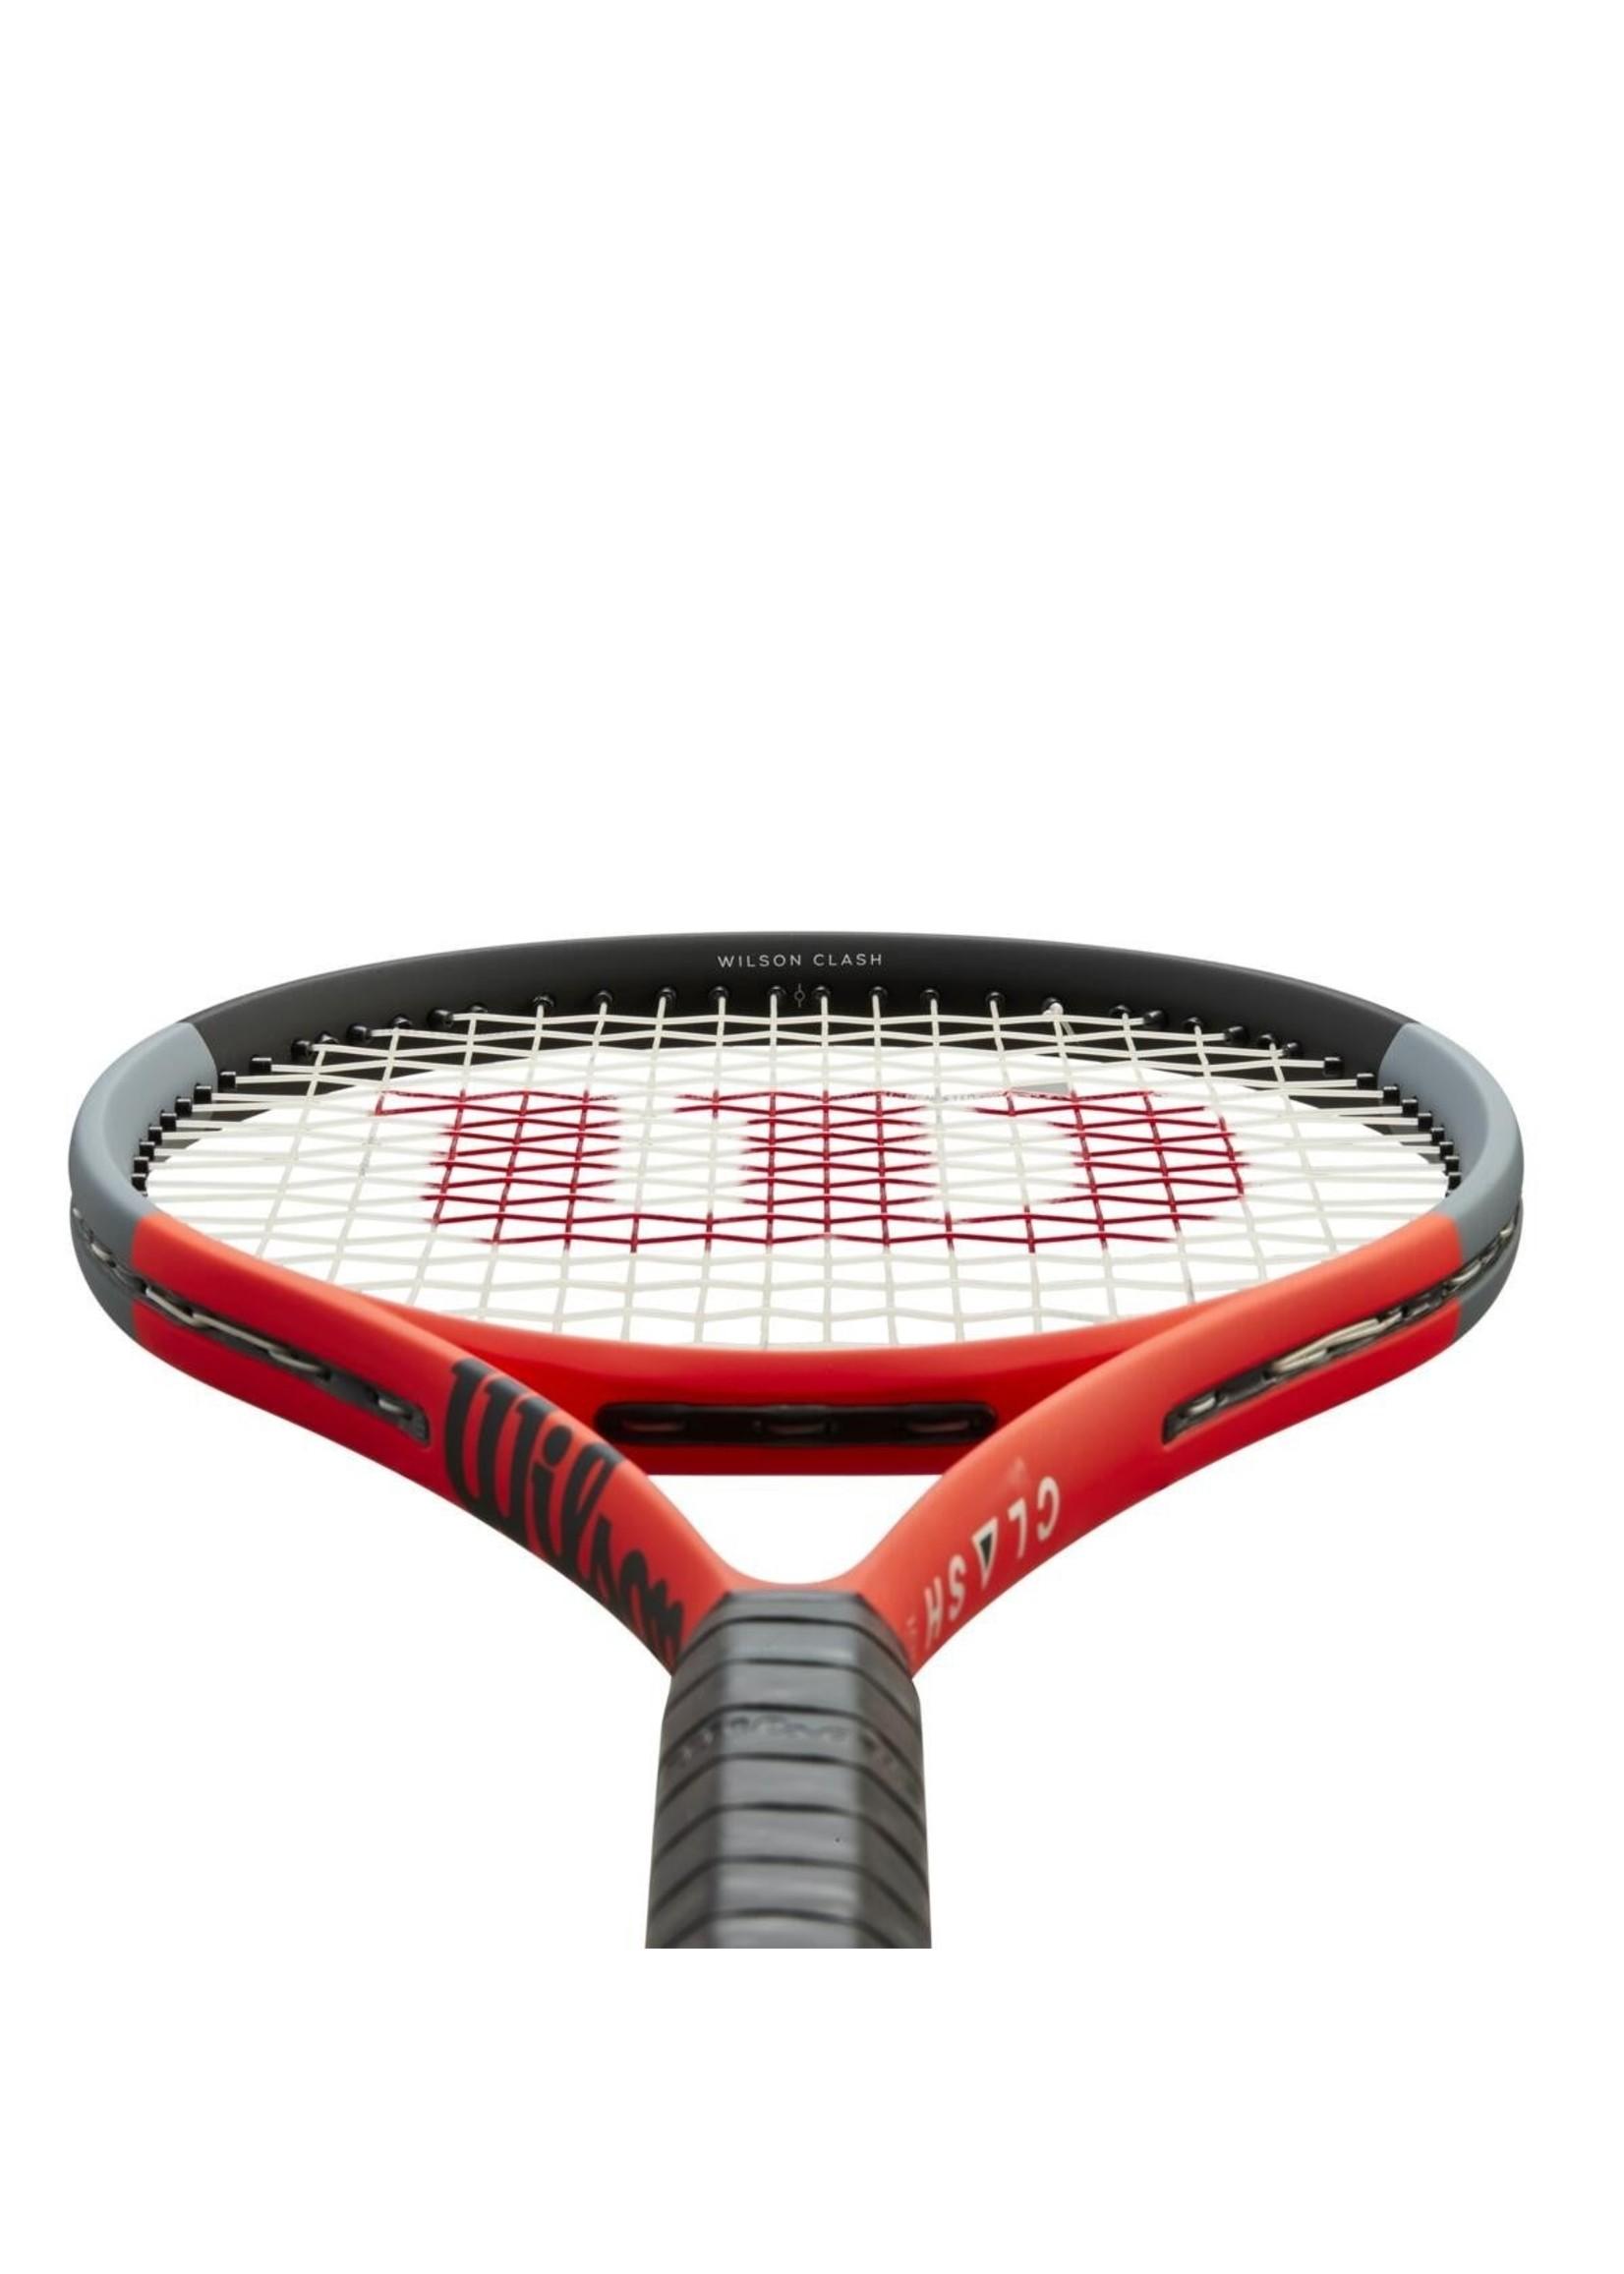 Wilson Wilson Clash 100 Reverse Tennis Racket (2021)